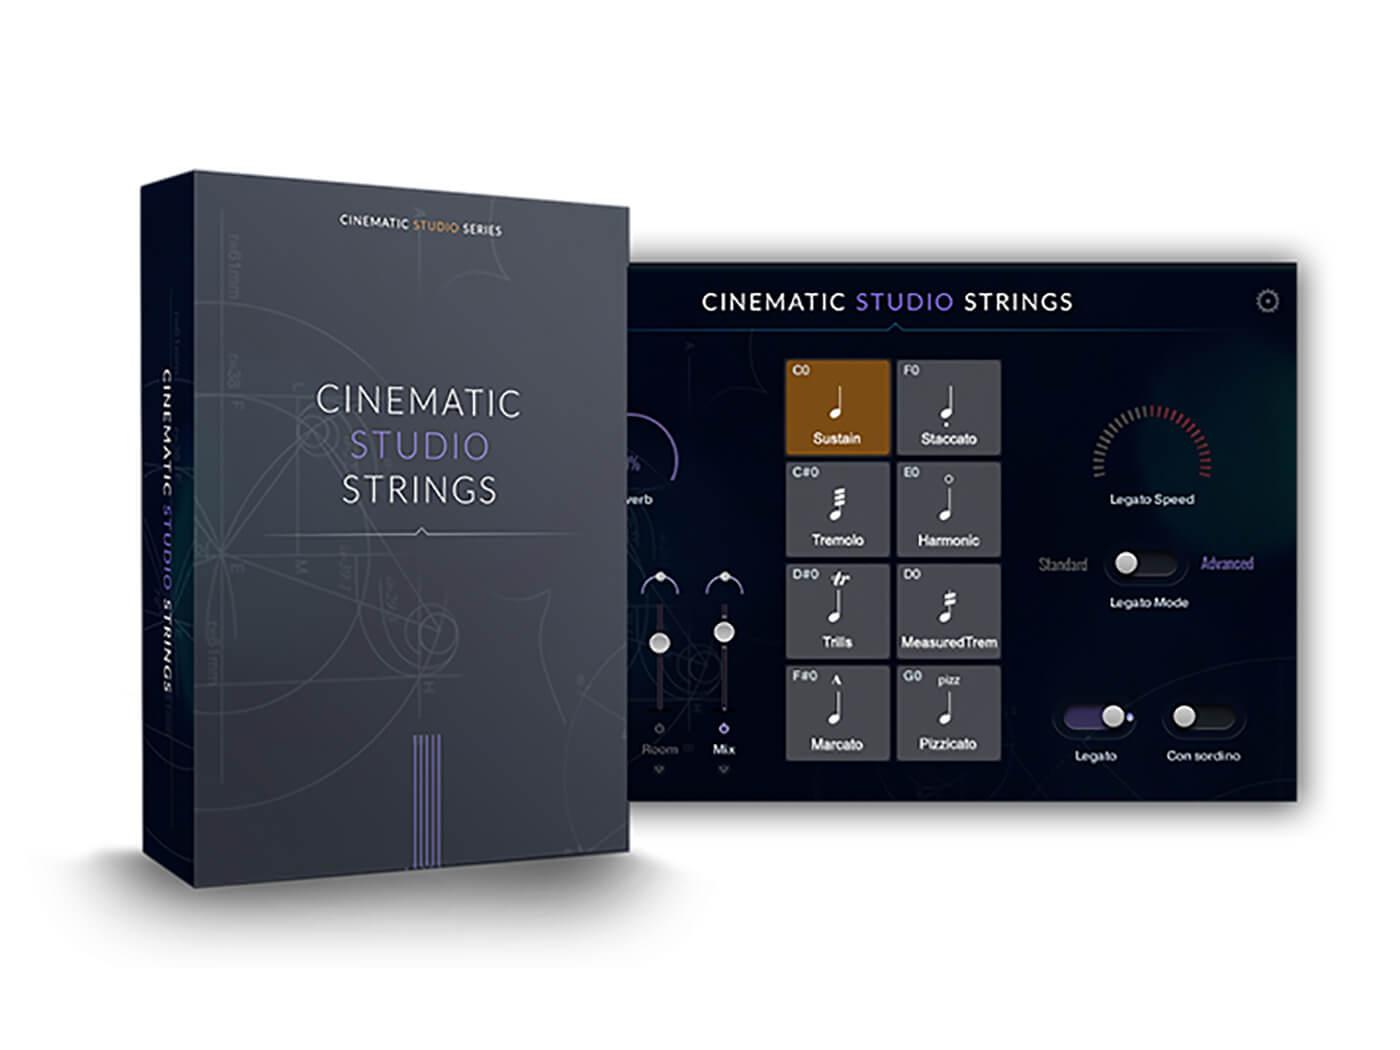 Cinematic Studio Strings